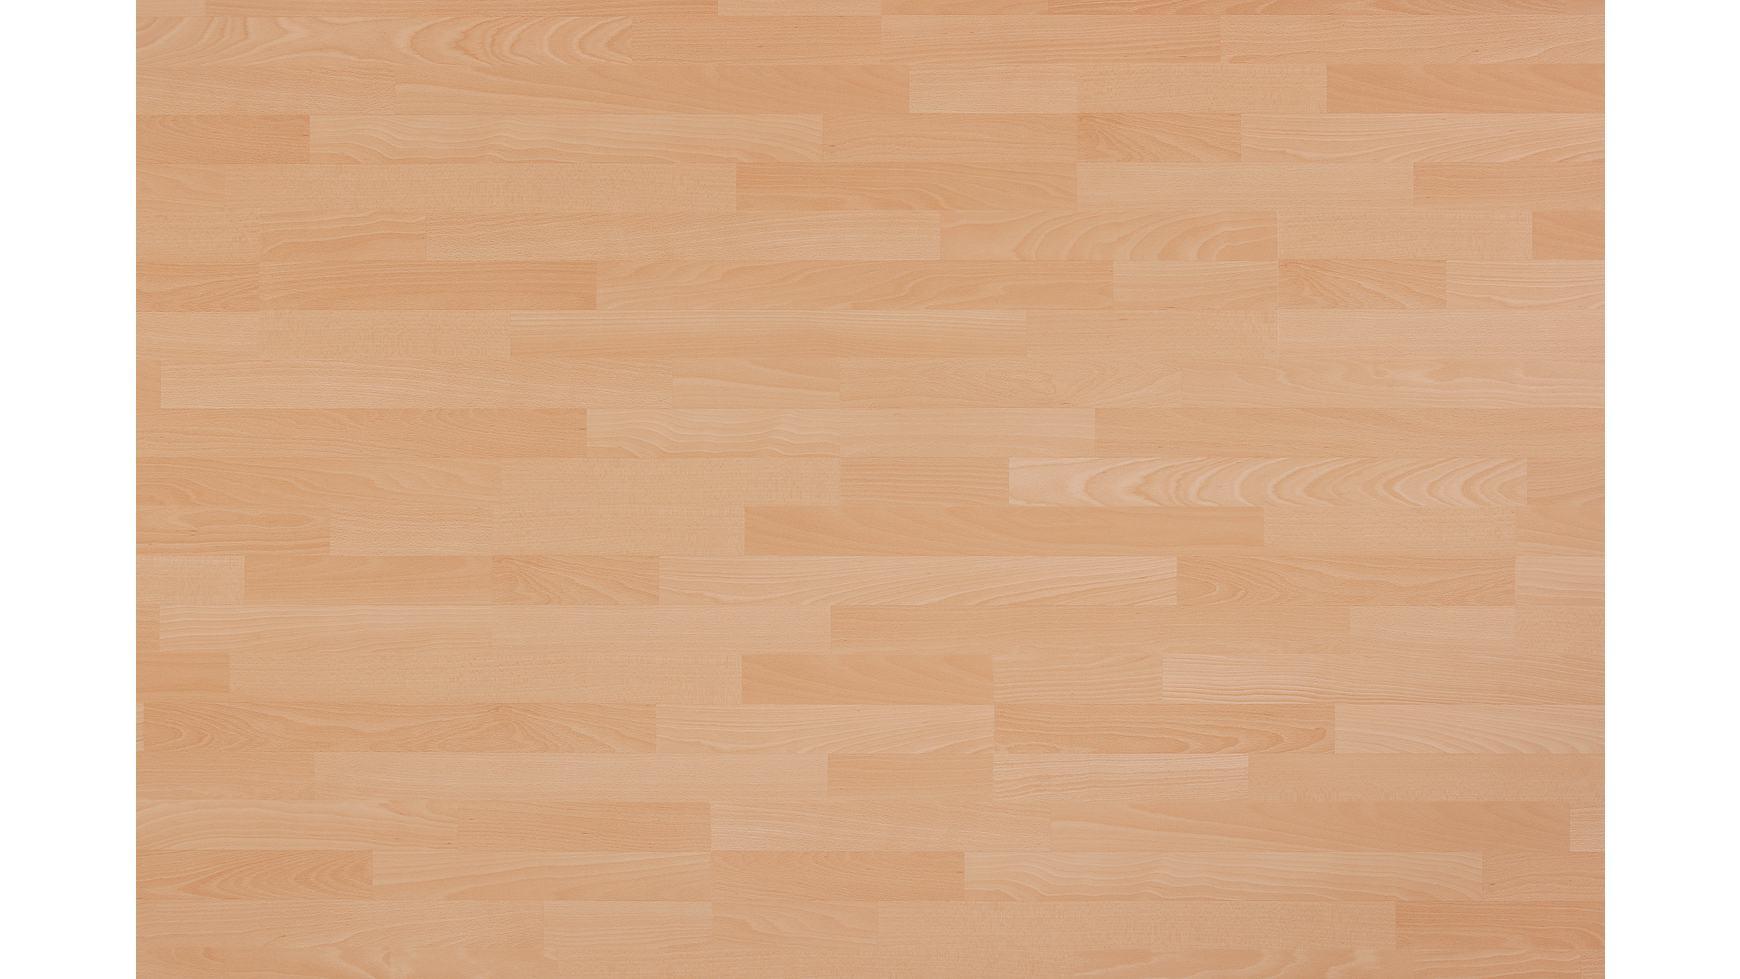 laminat fr preise excellent haro tritty gran via v alpineiche natur authentic matt with laminat. Black Bedroom Furniture Sets. Home Design Ideas